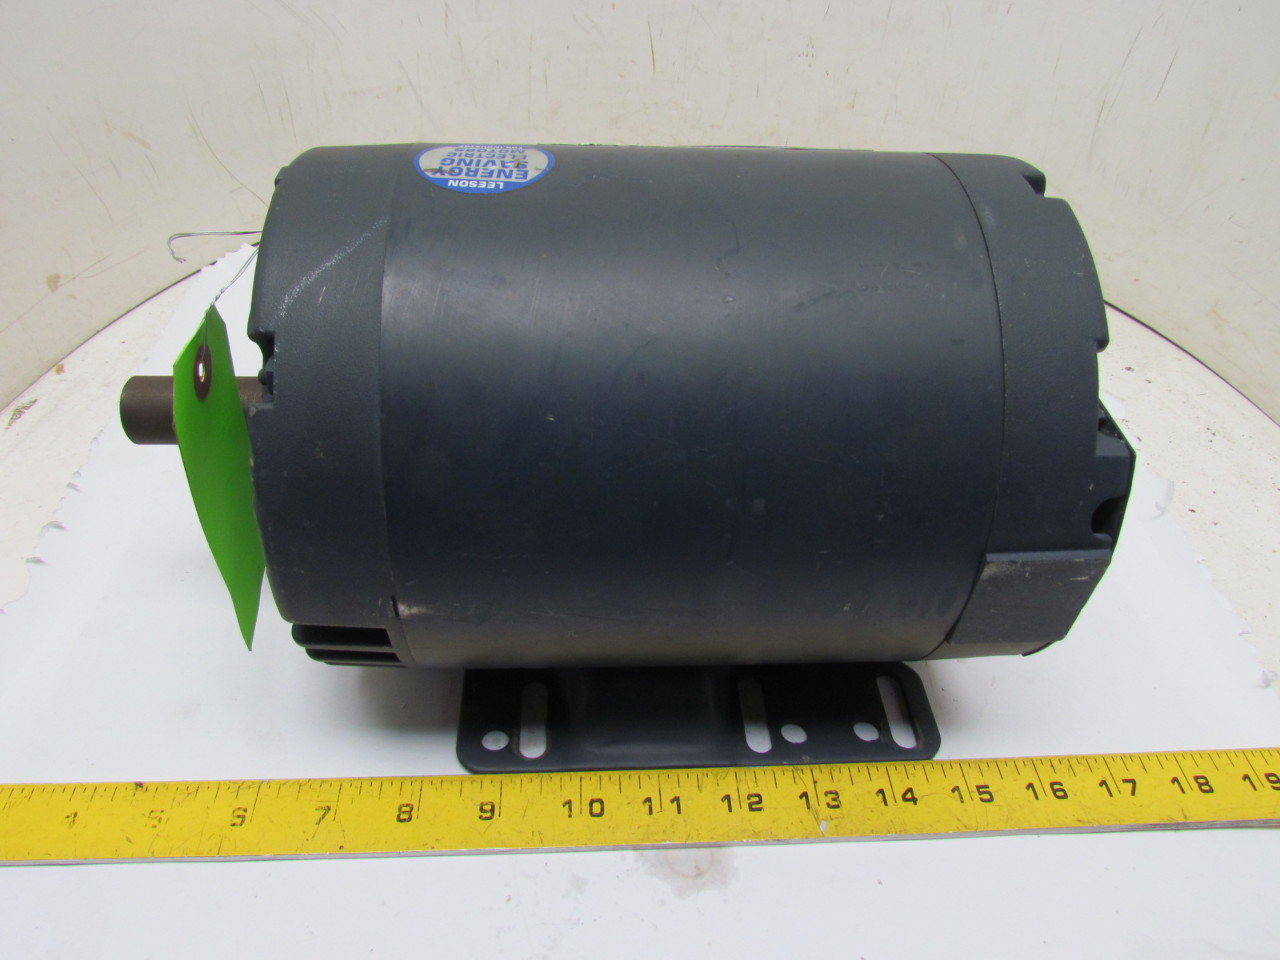 460 volt 3 phase wiring diagram sub woofer century motor